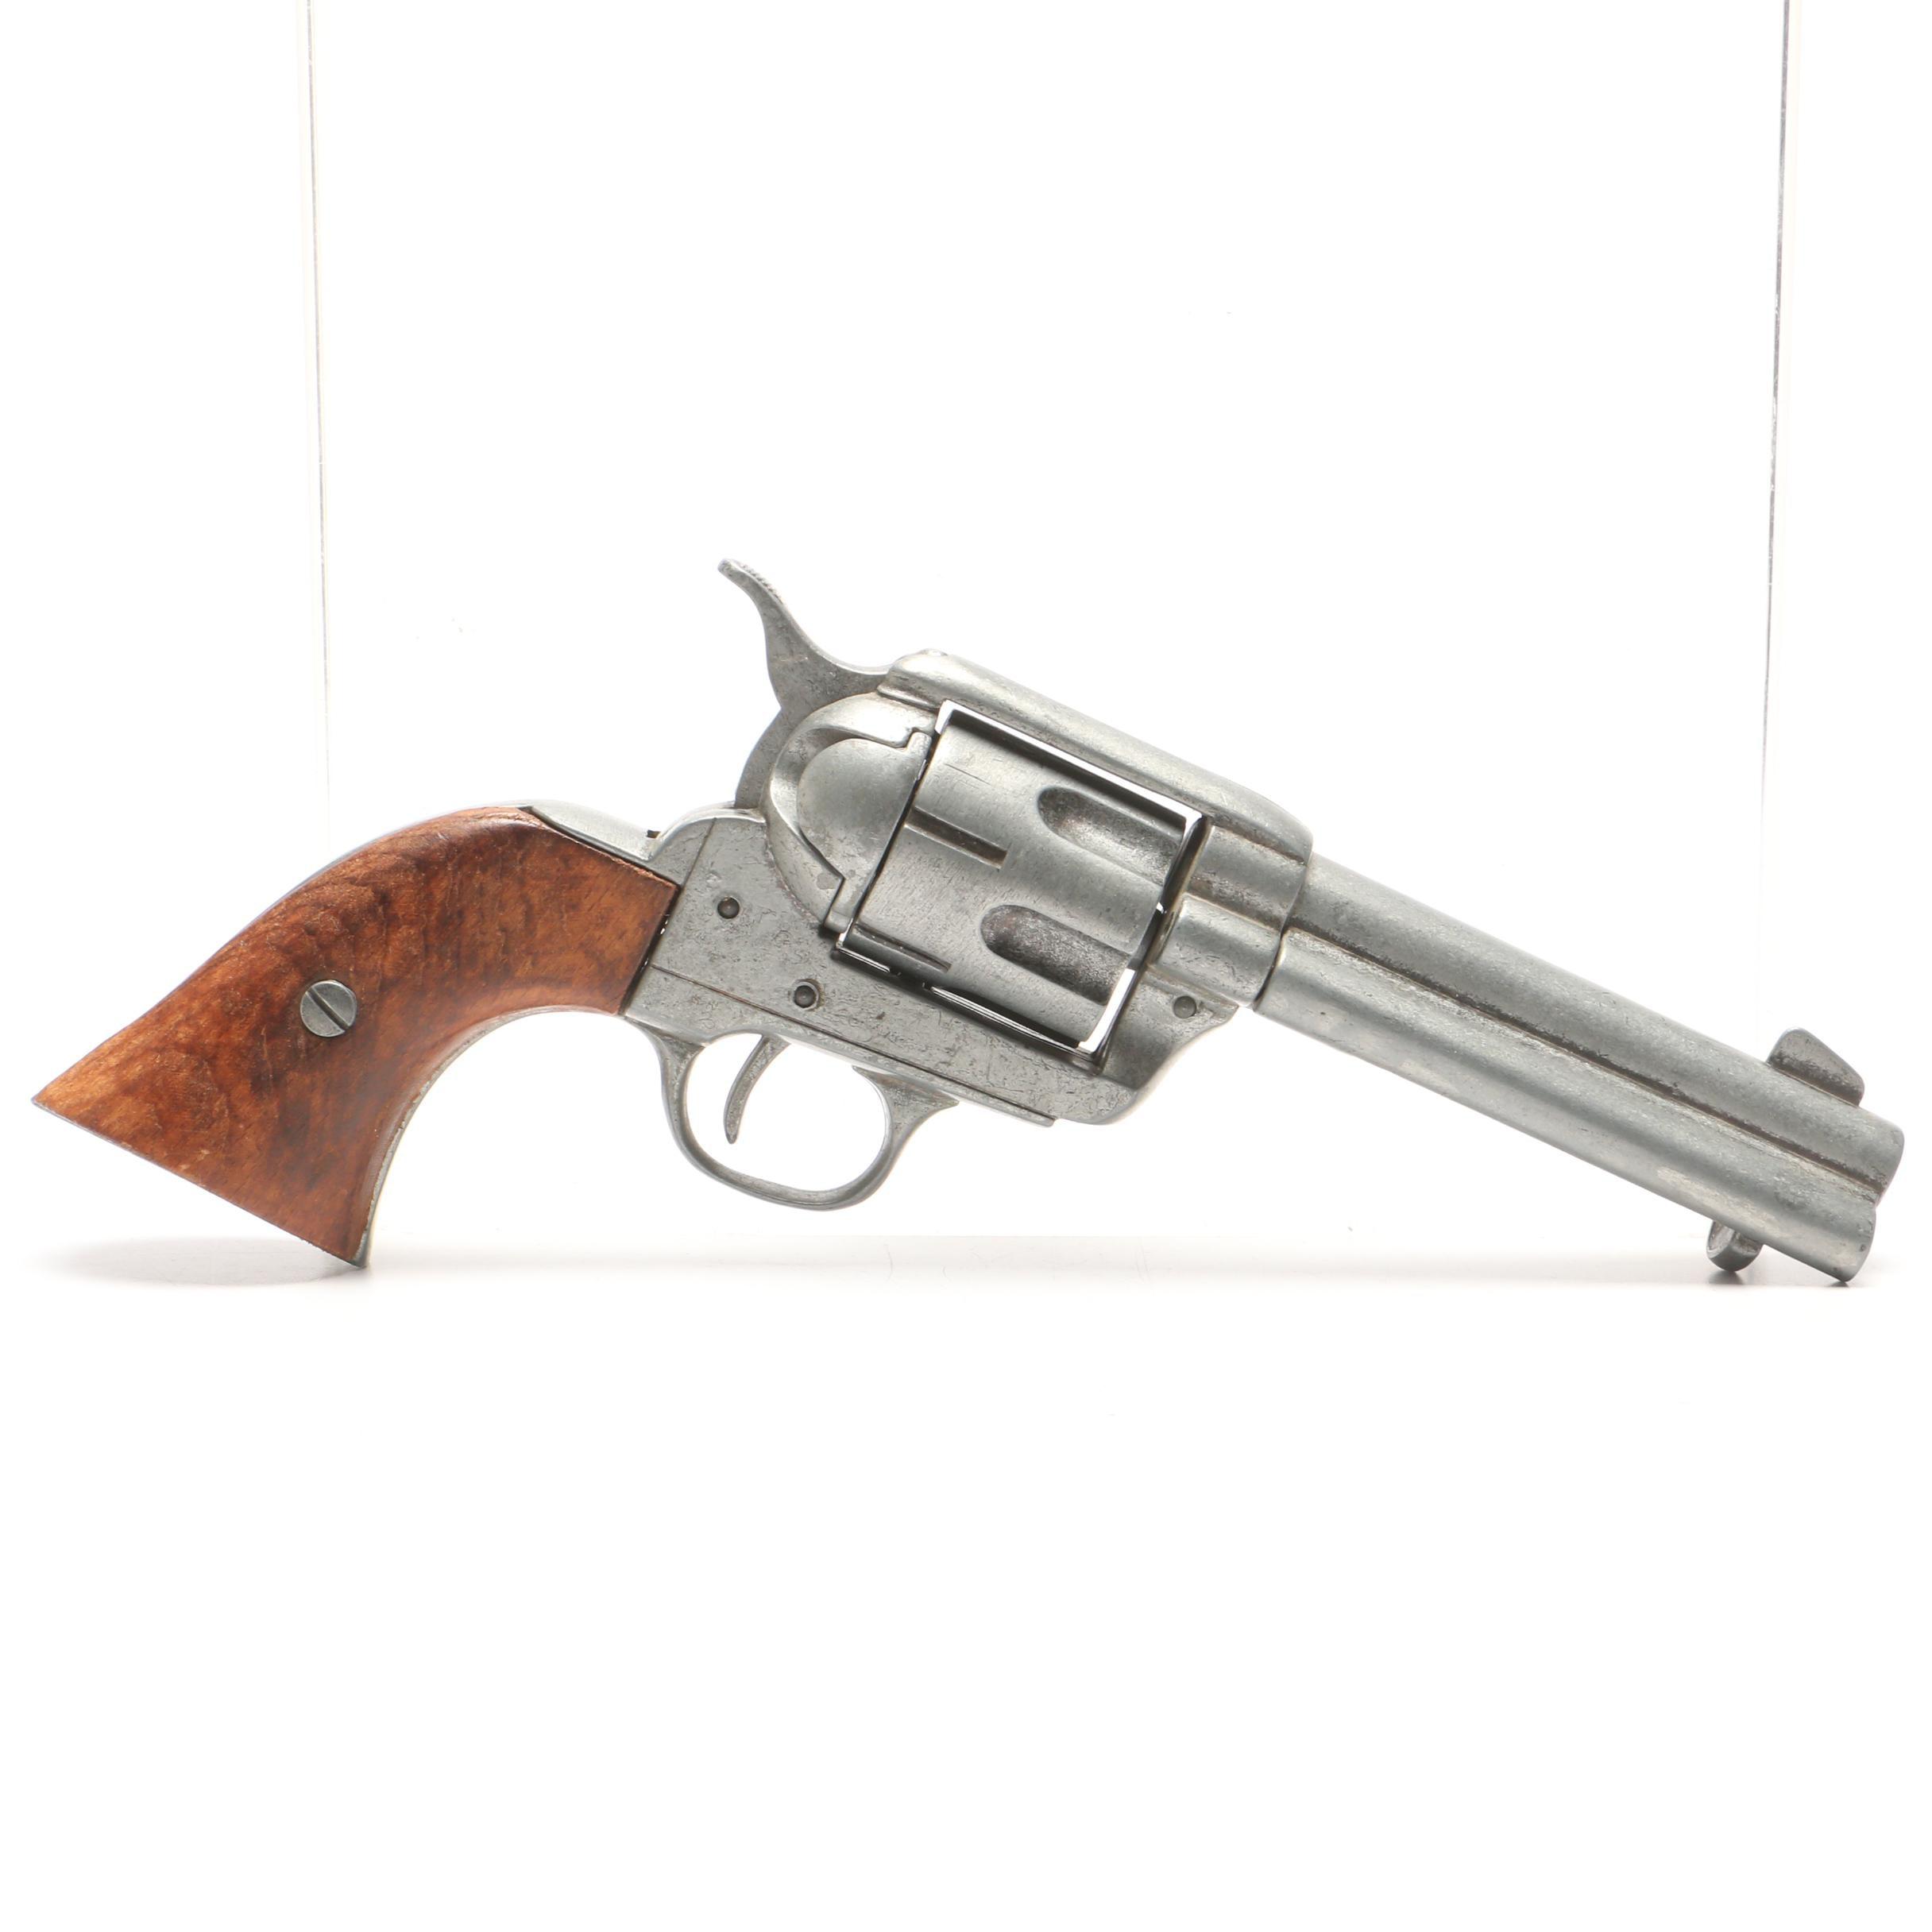 Replica Non-Firing Western Era Colt Revolver or Pistol